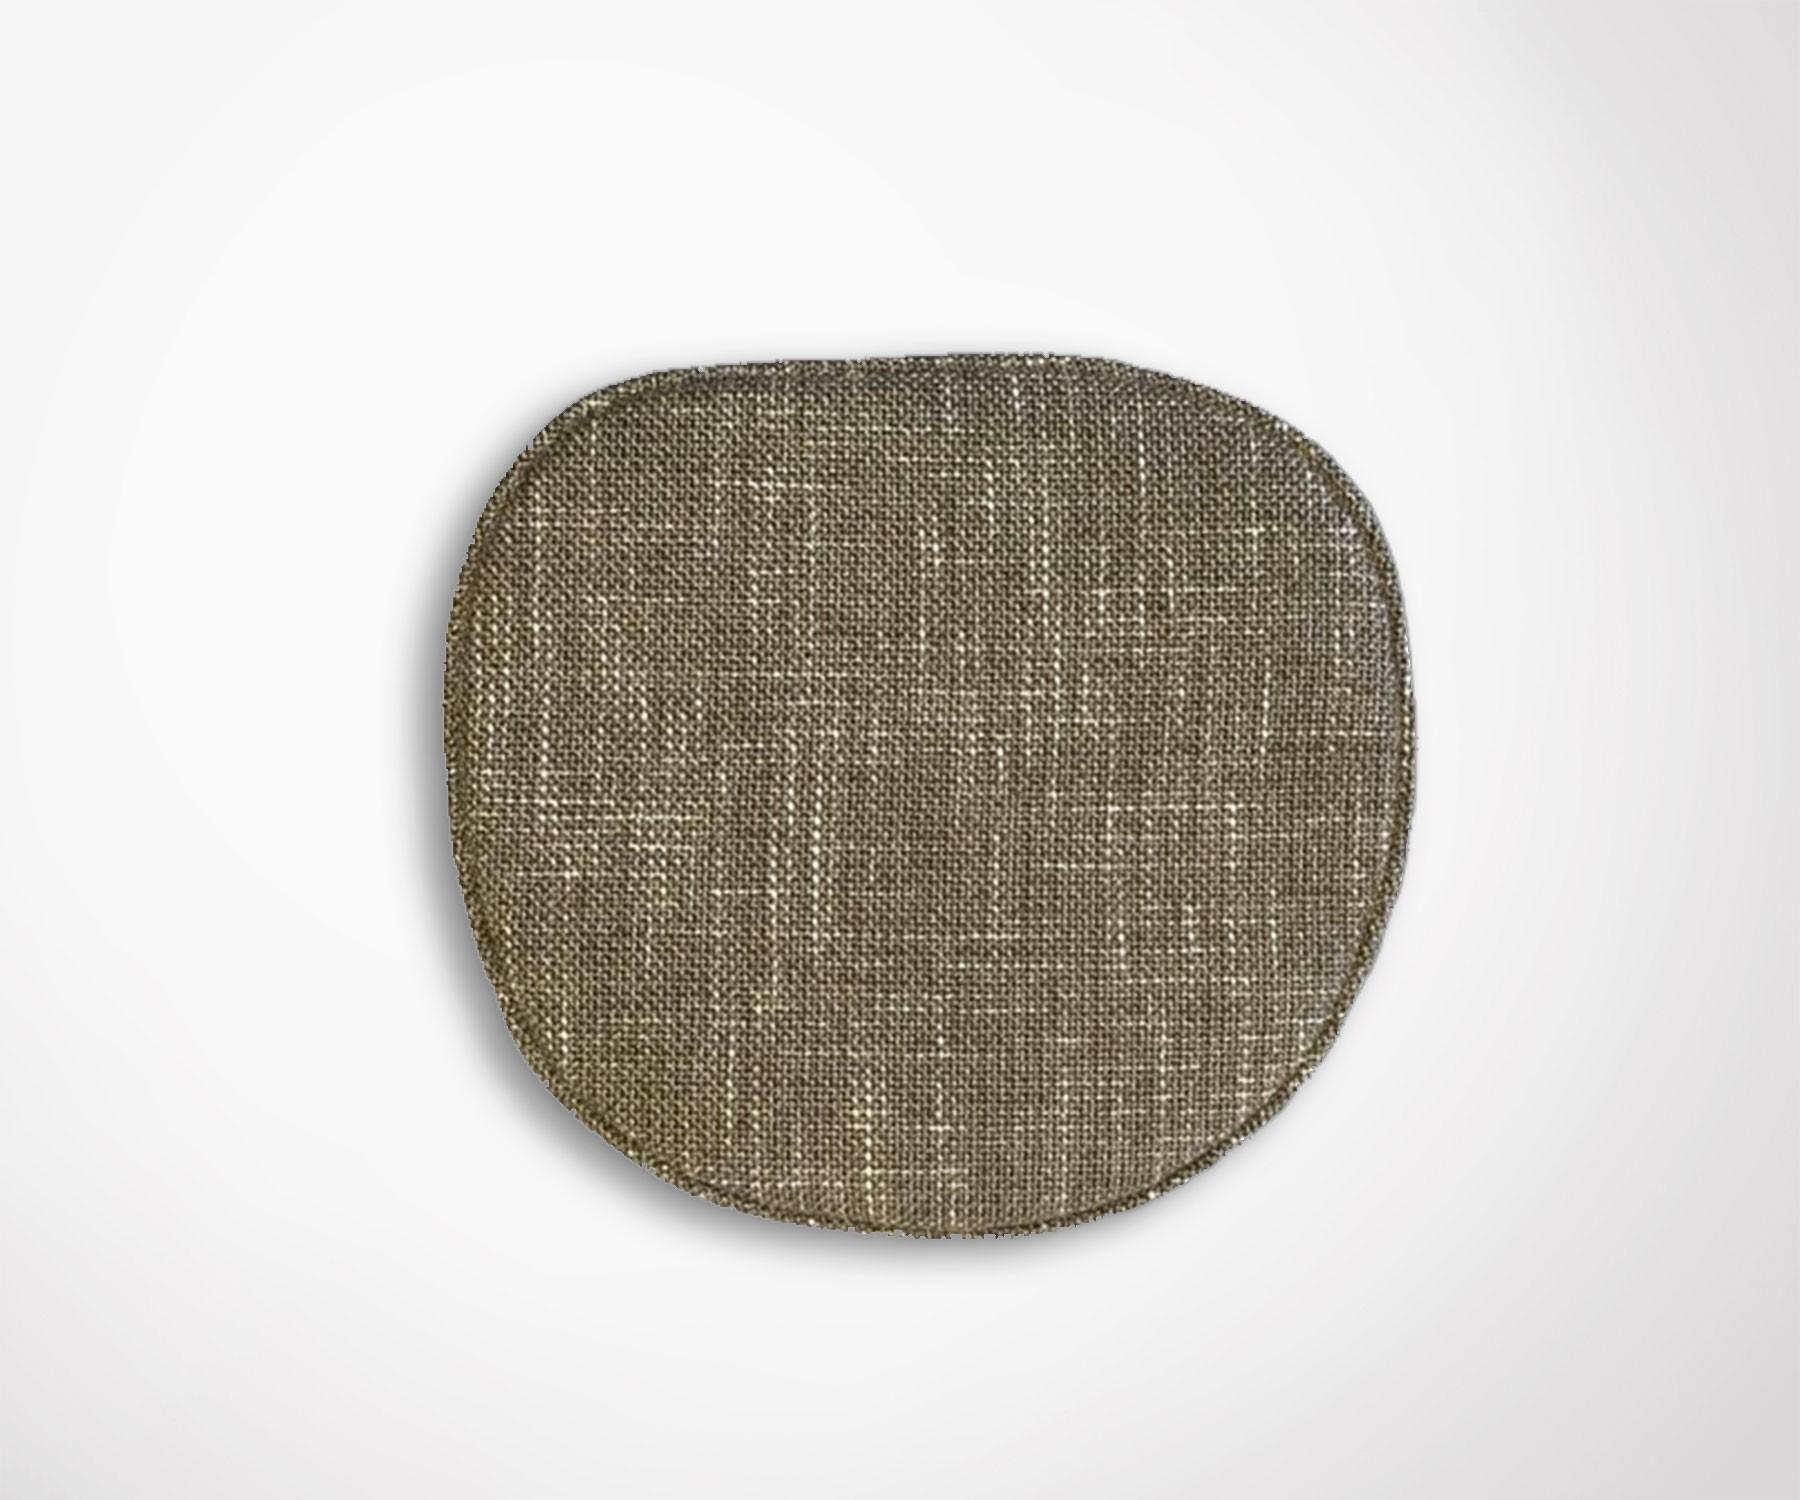 Galette Assise Chaise Eames Tissu Effet Tricote